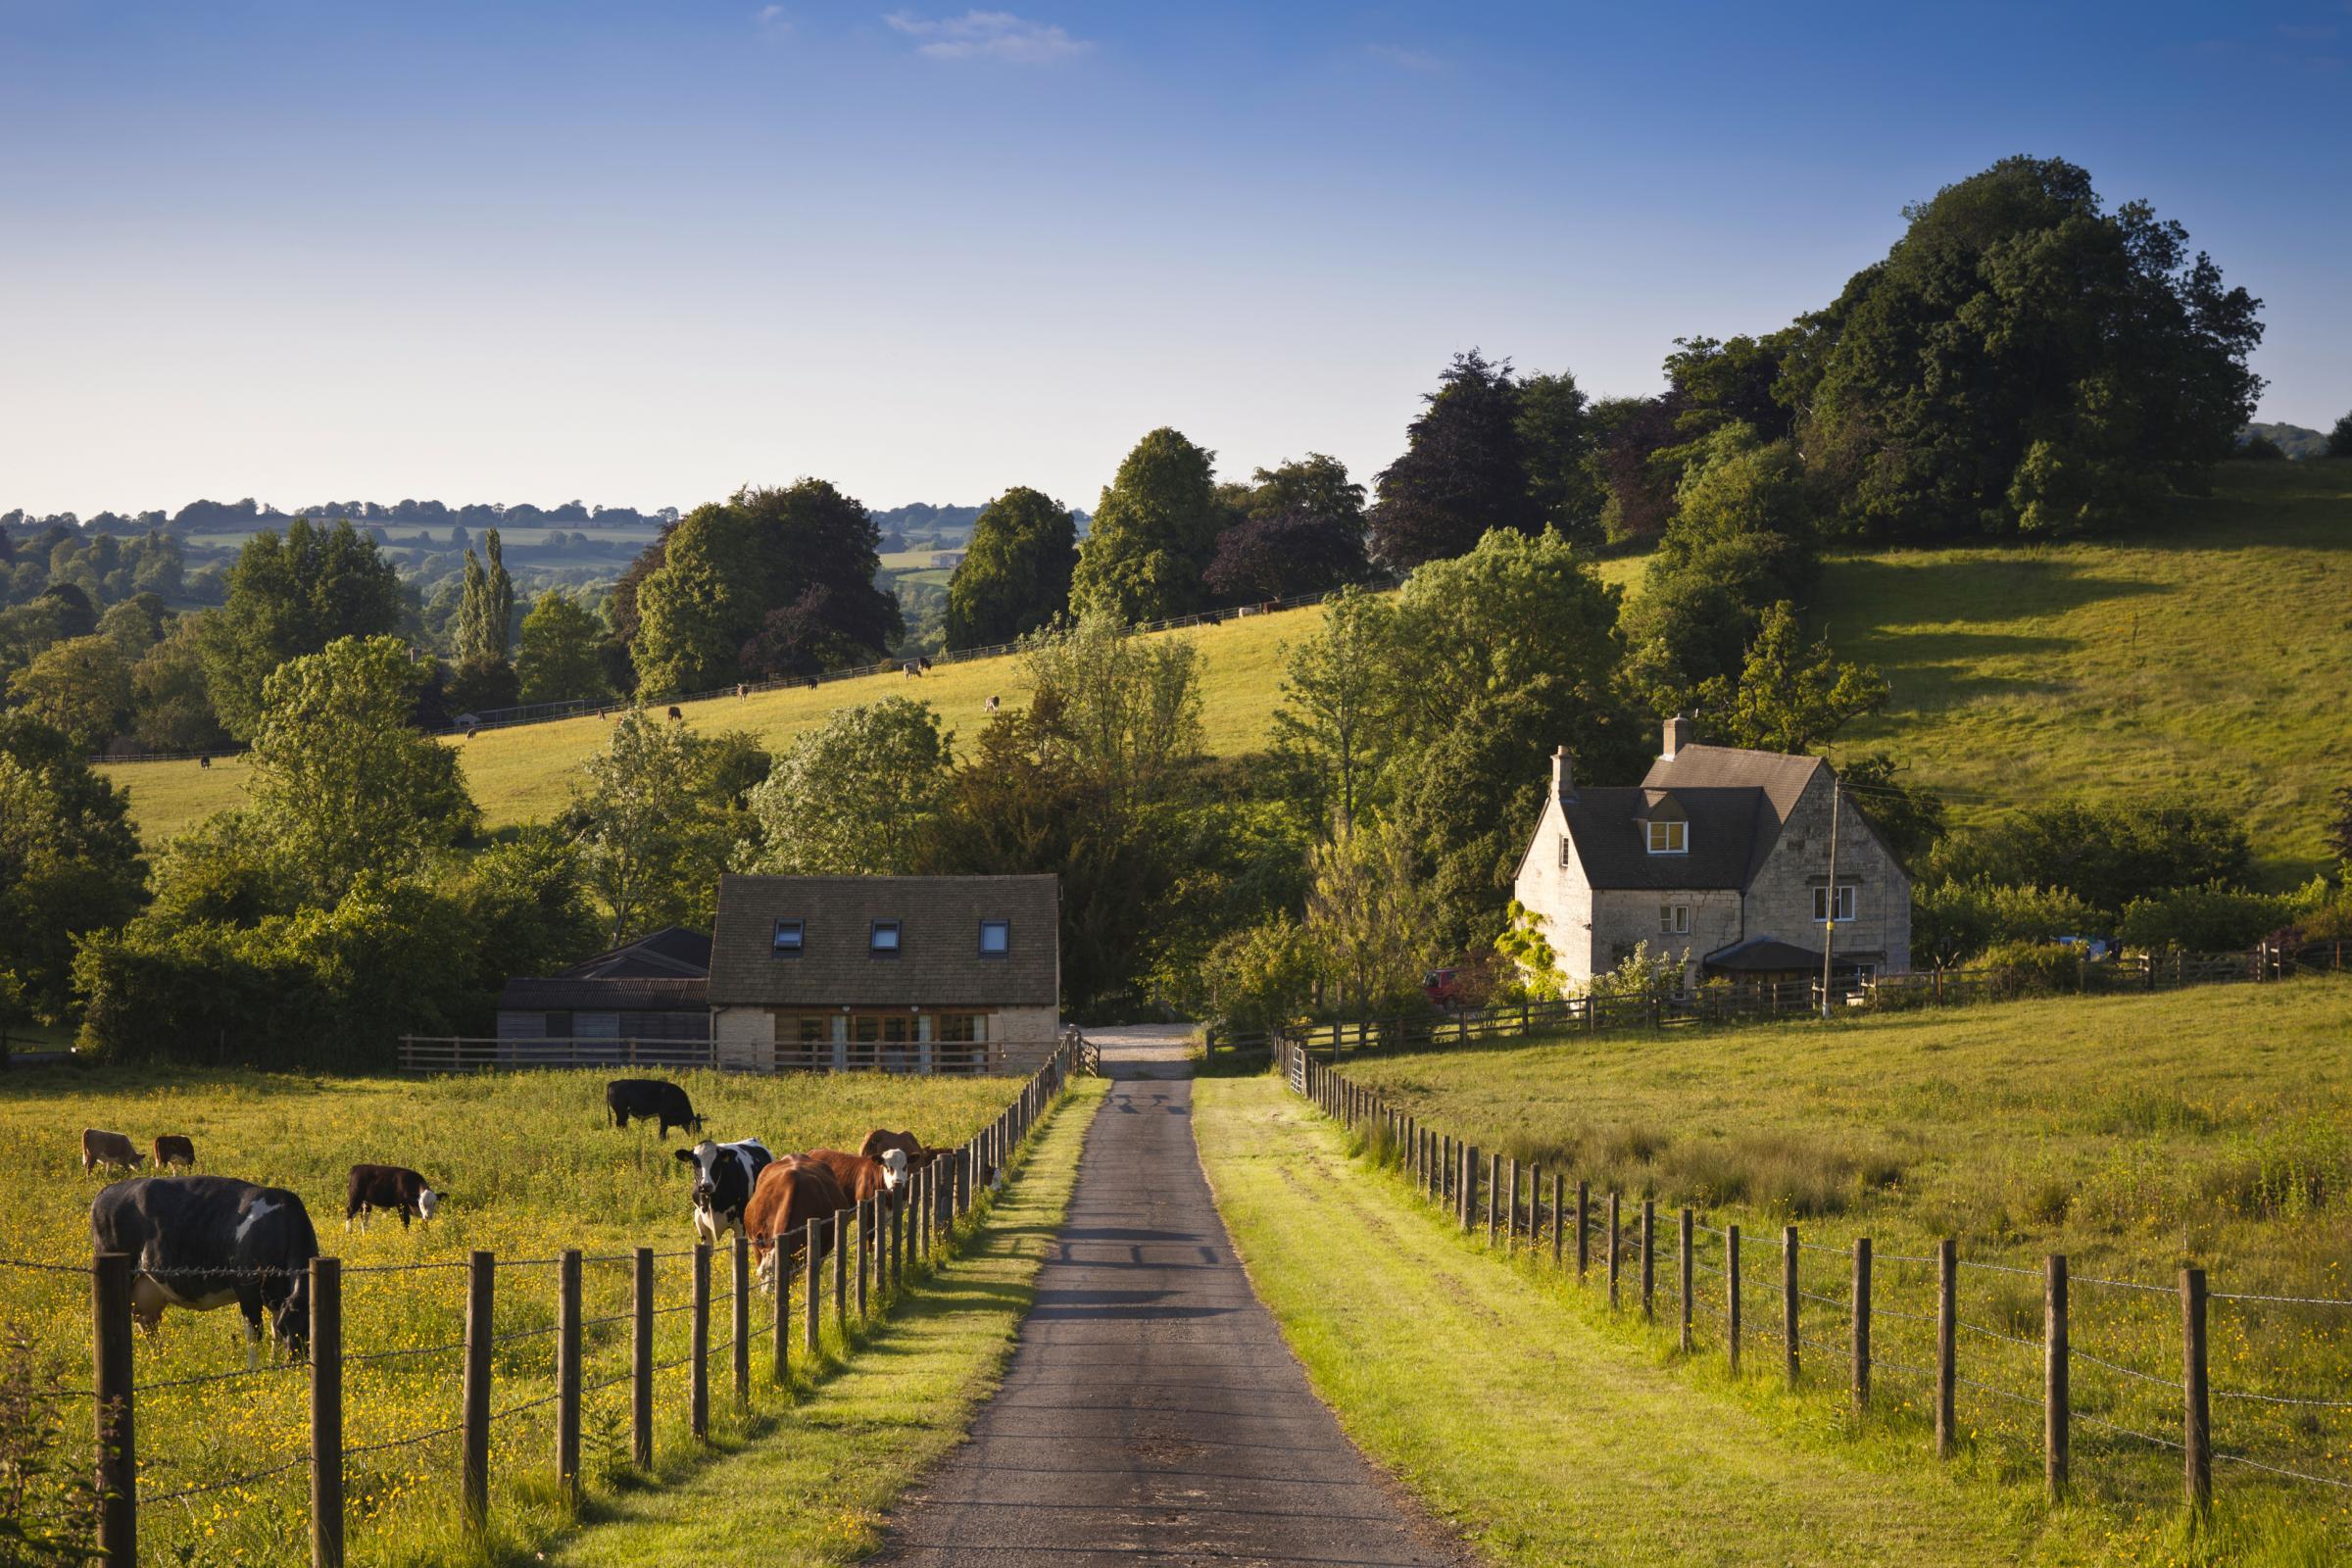 city and farm life